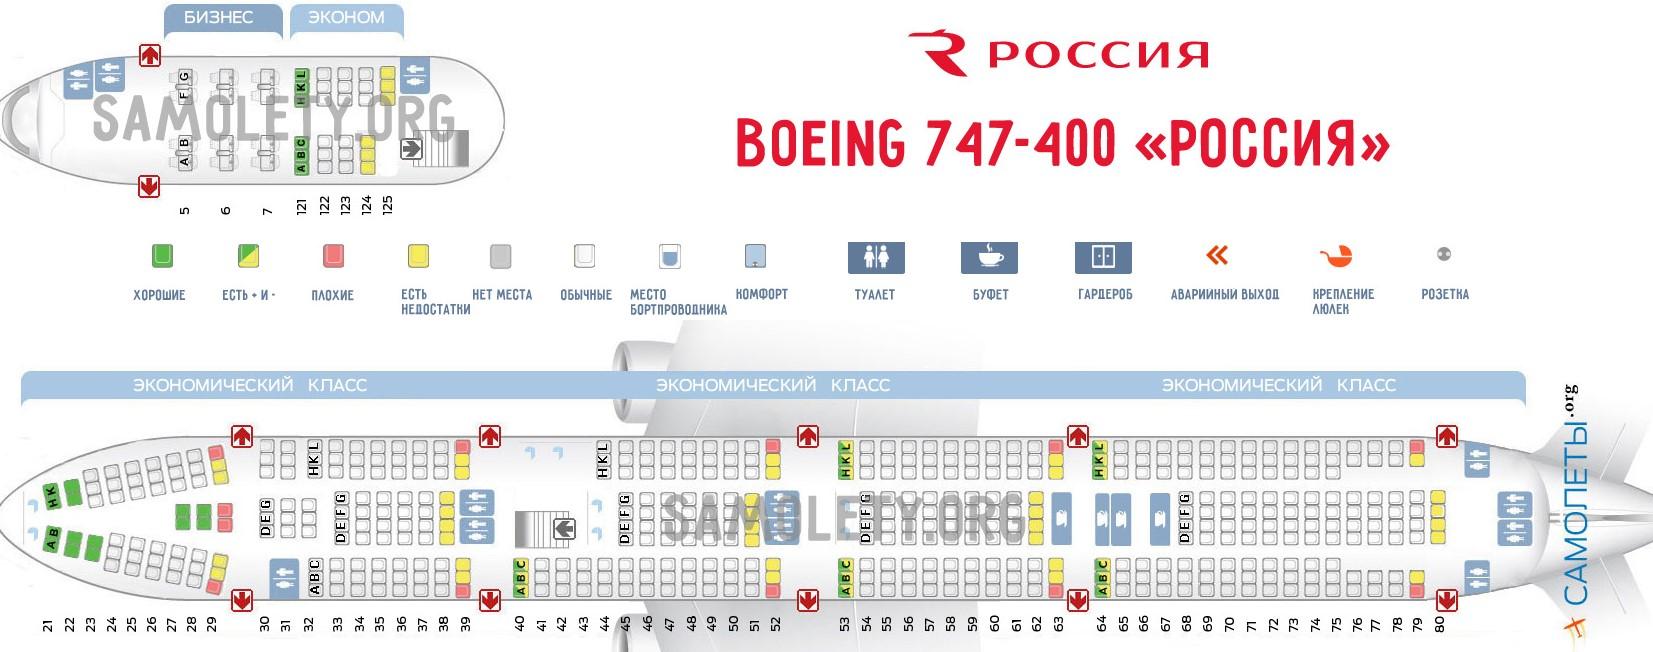 Боинг 747-400 - Россия: схема салона